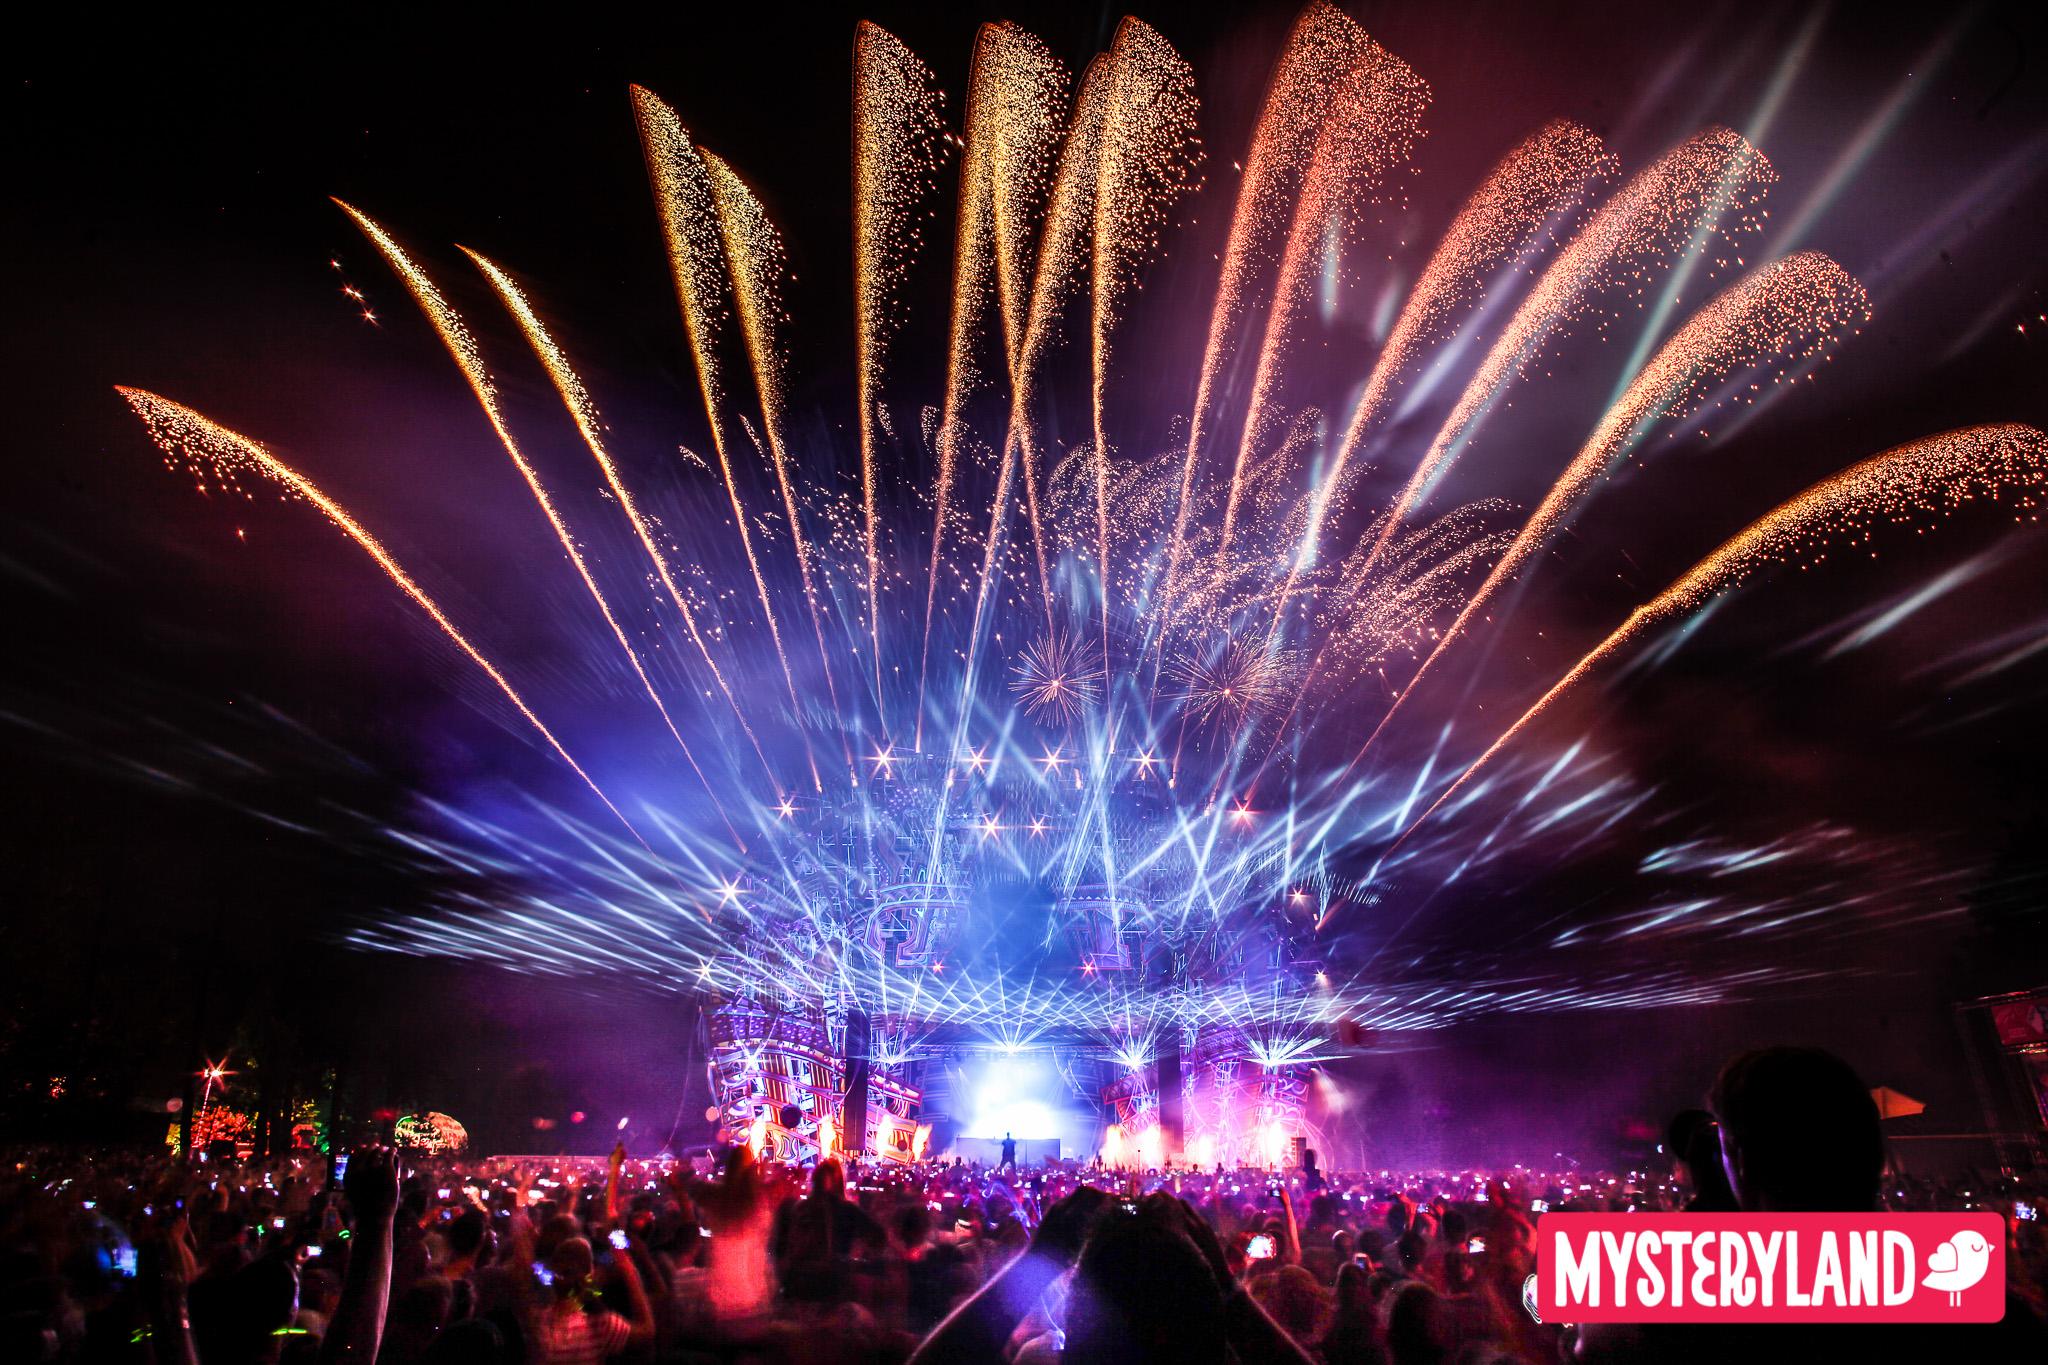 Das war das Mysteryland-Festival 2015